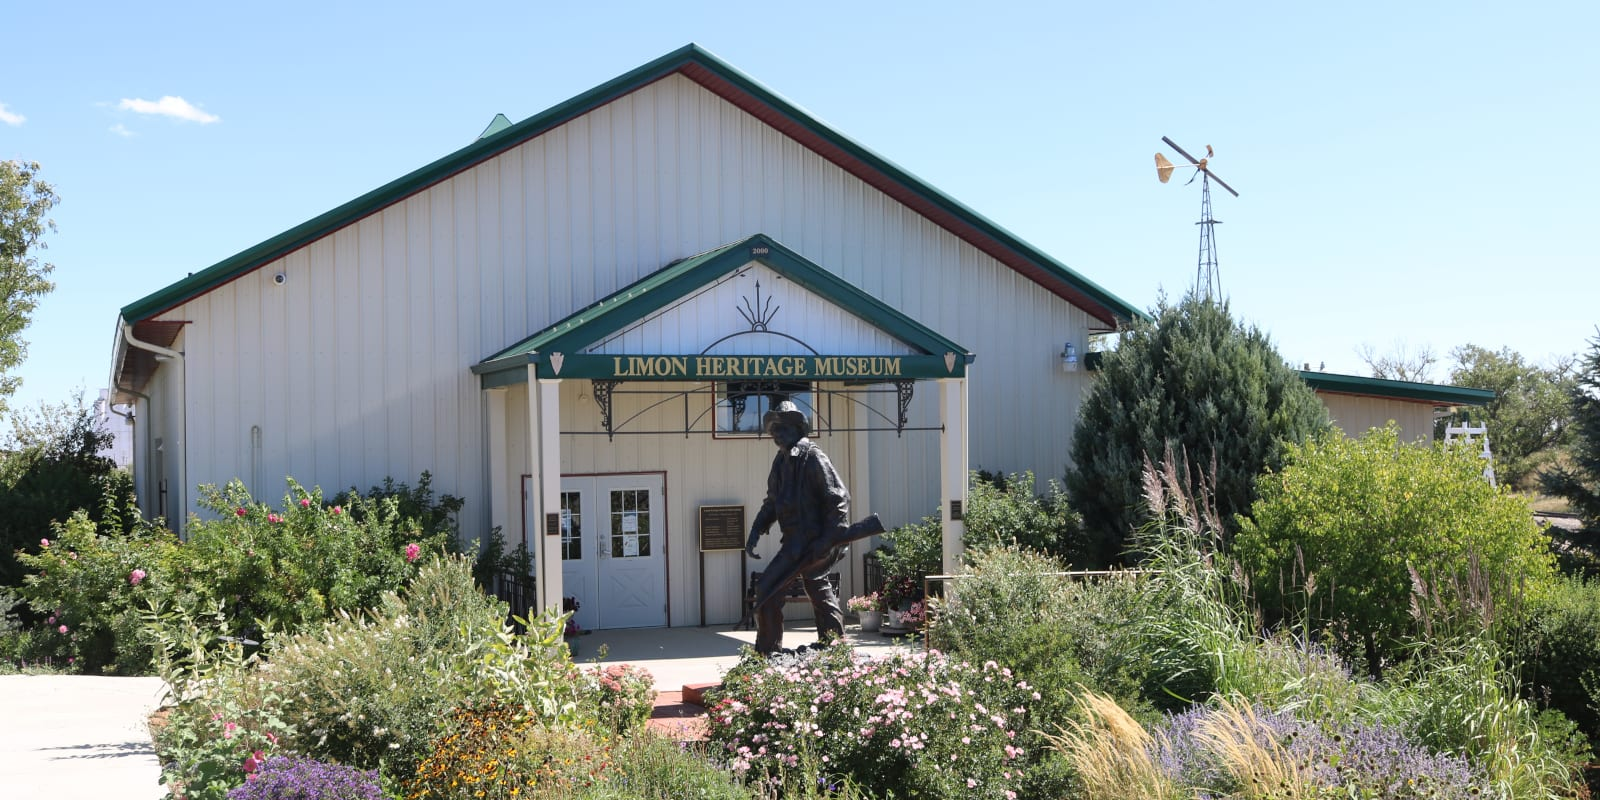 The Limon Heritage Museum in Limon, Colorado